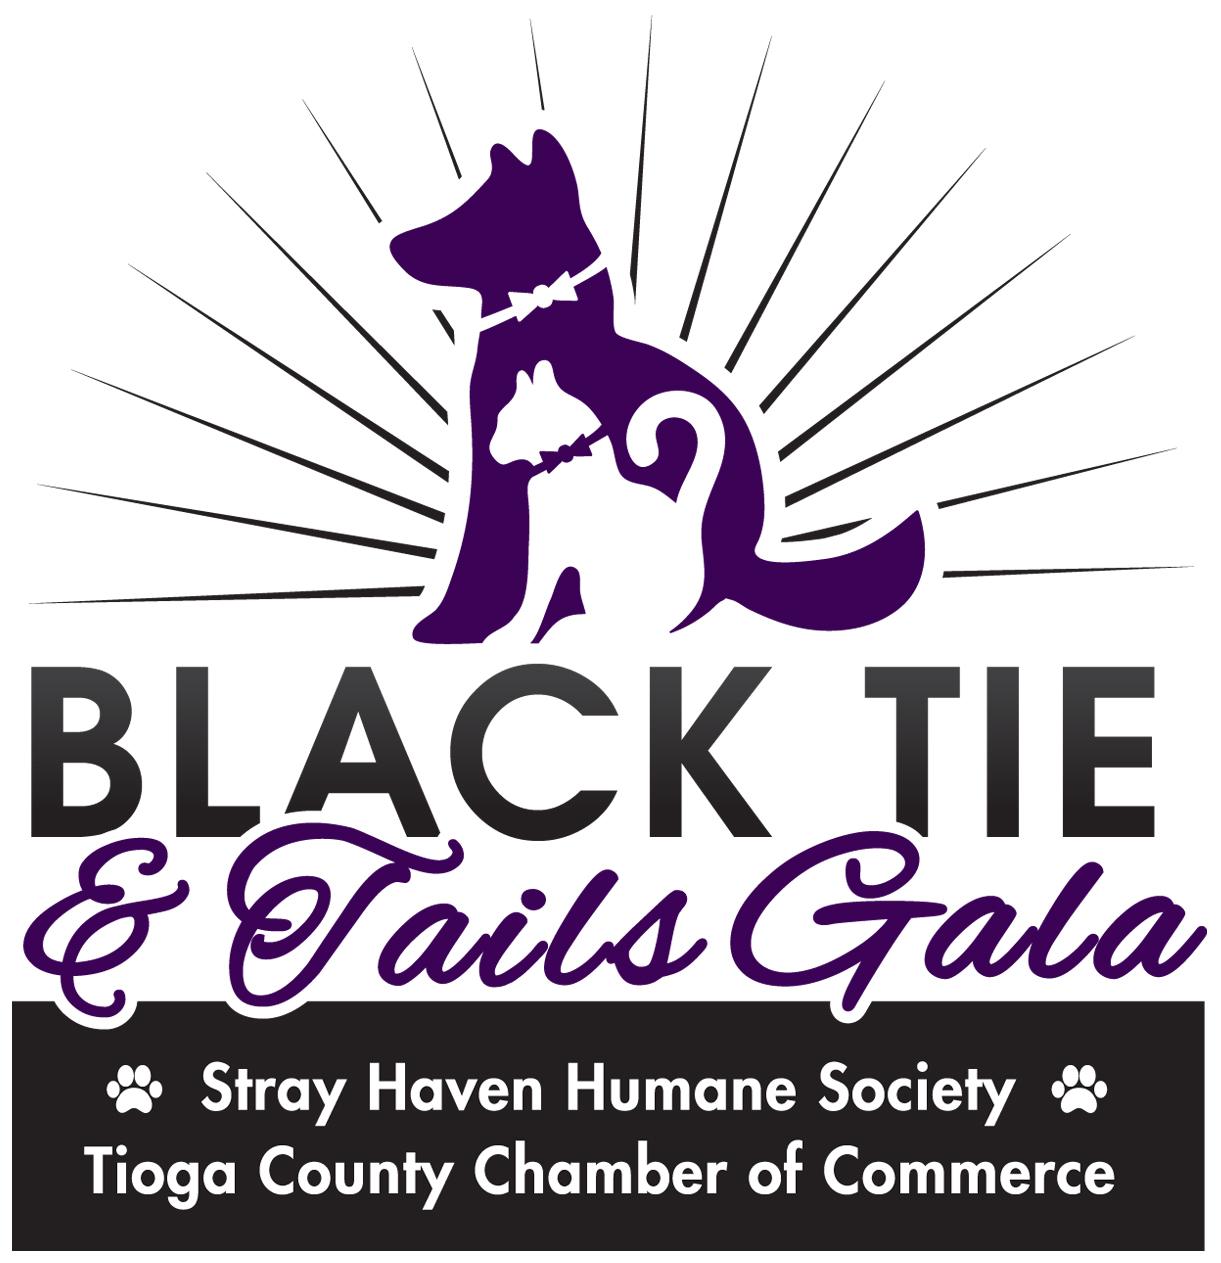 BlackTieTails_Gala_Logo_Final.jpg